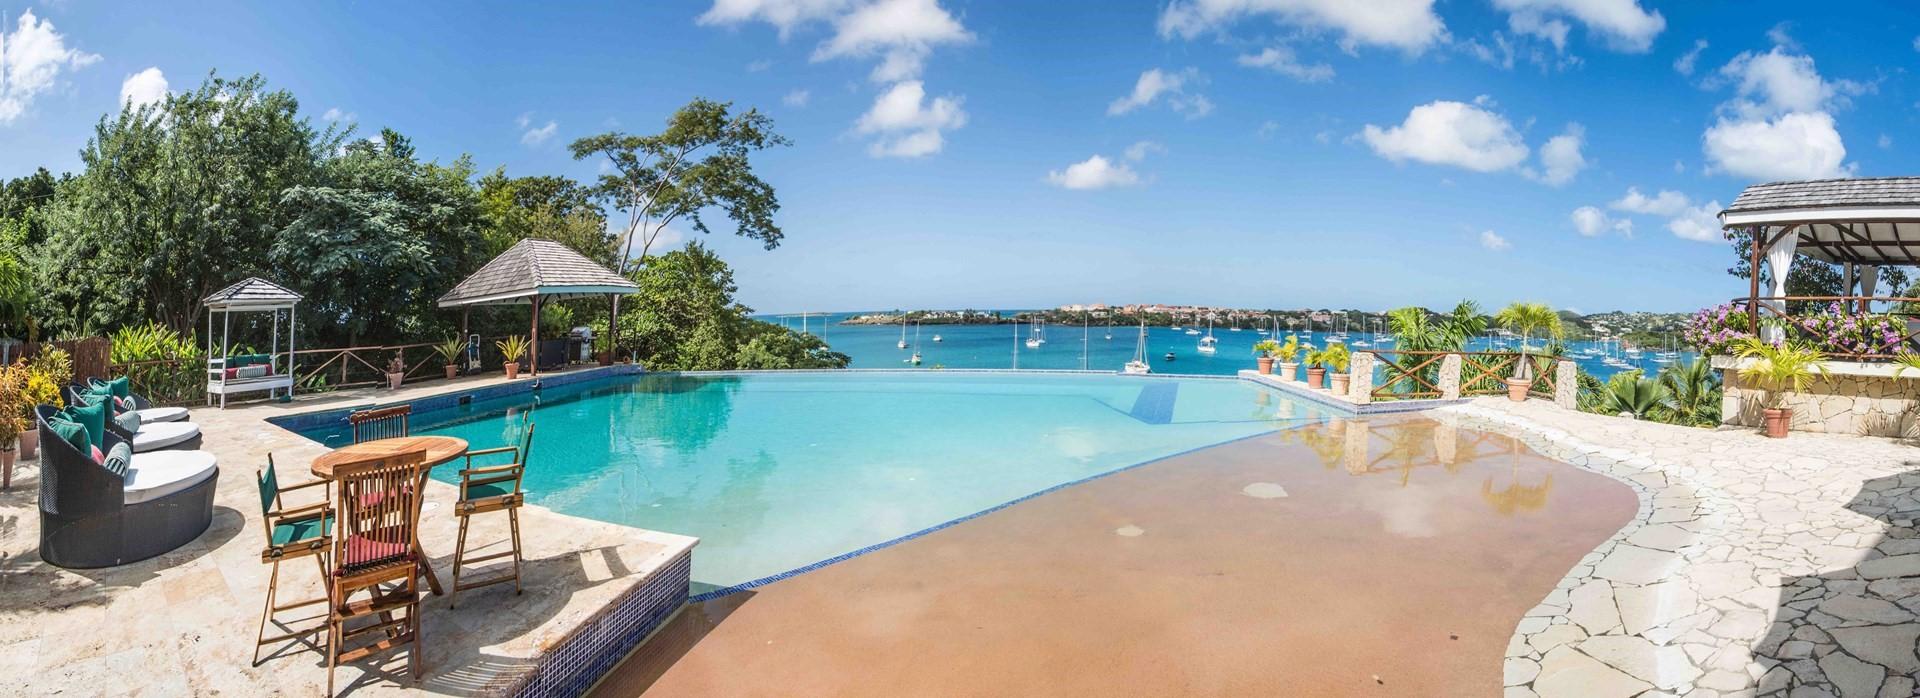 large-family-caribbean-villa-grenada-poo